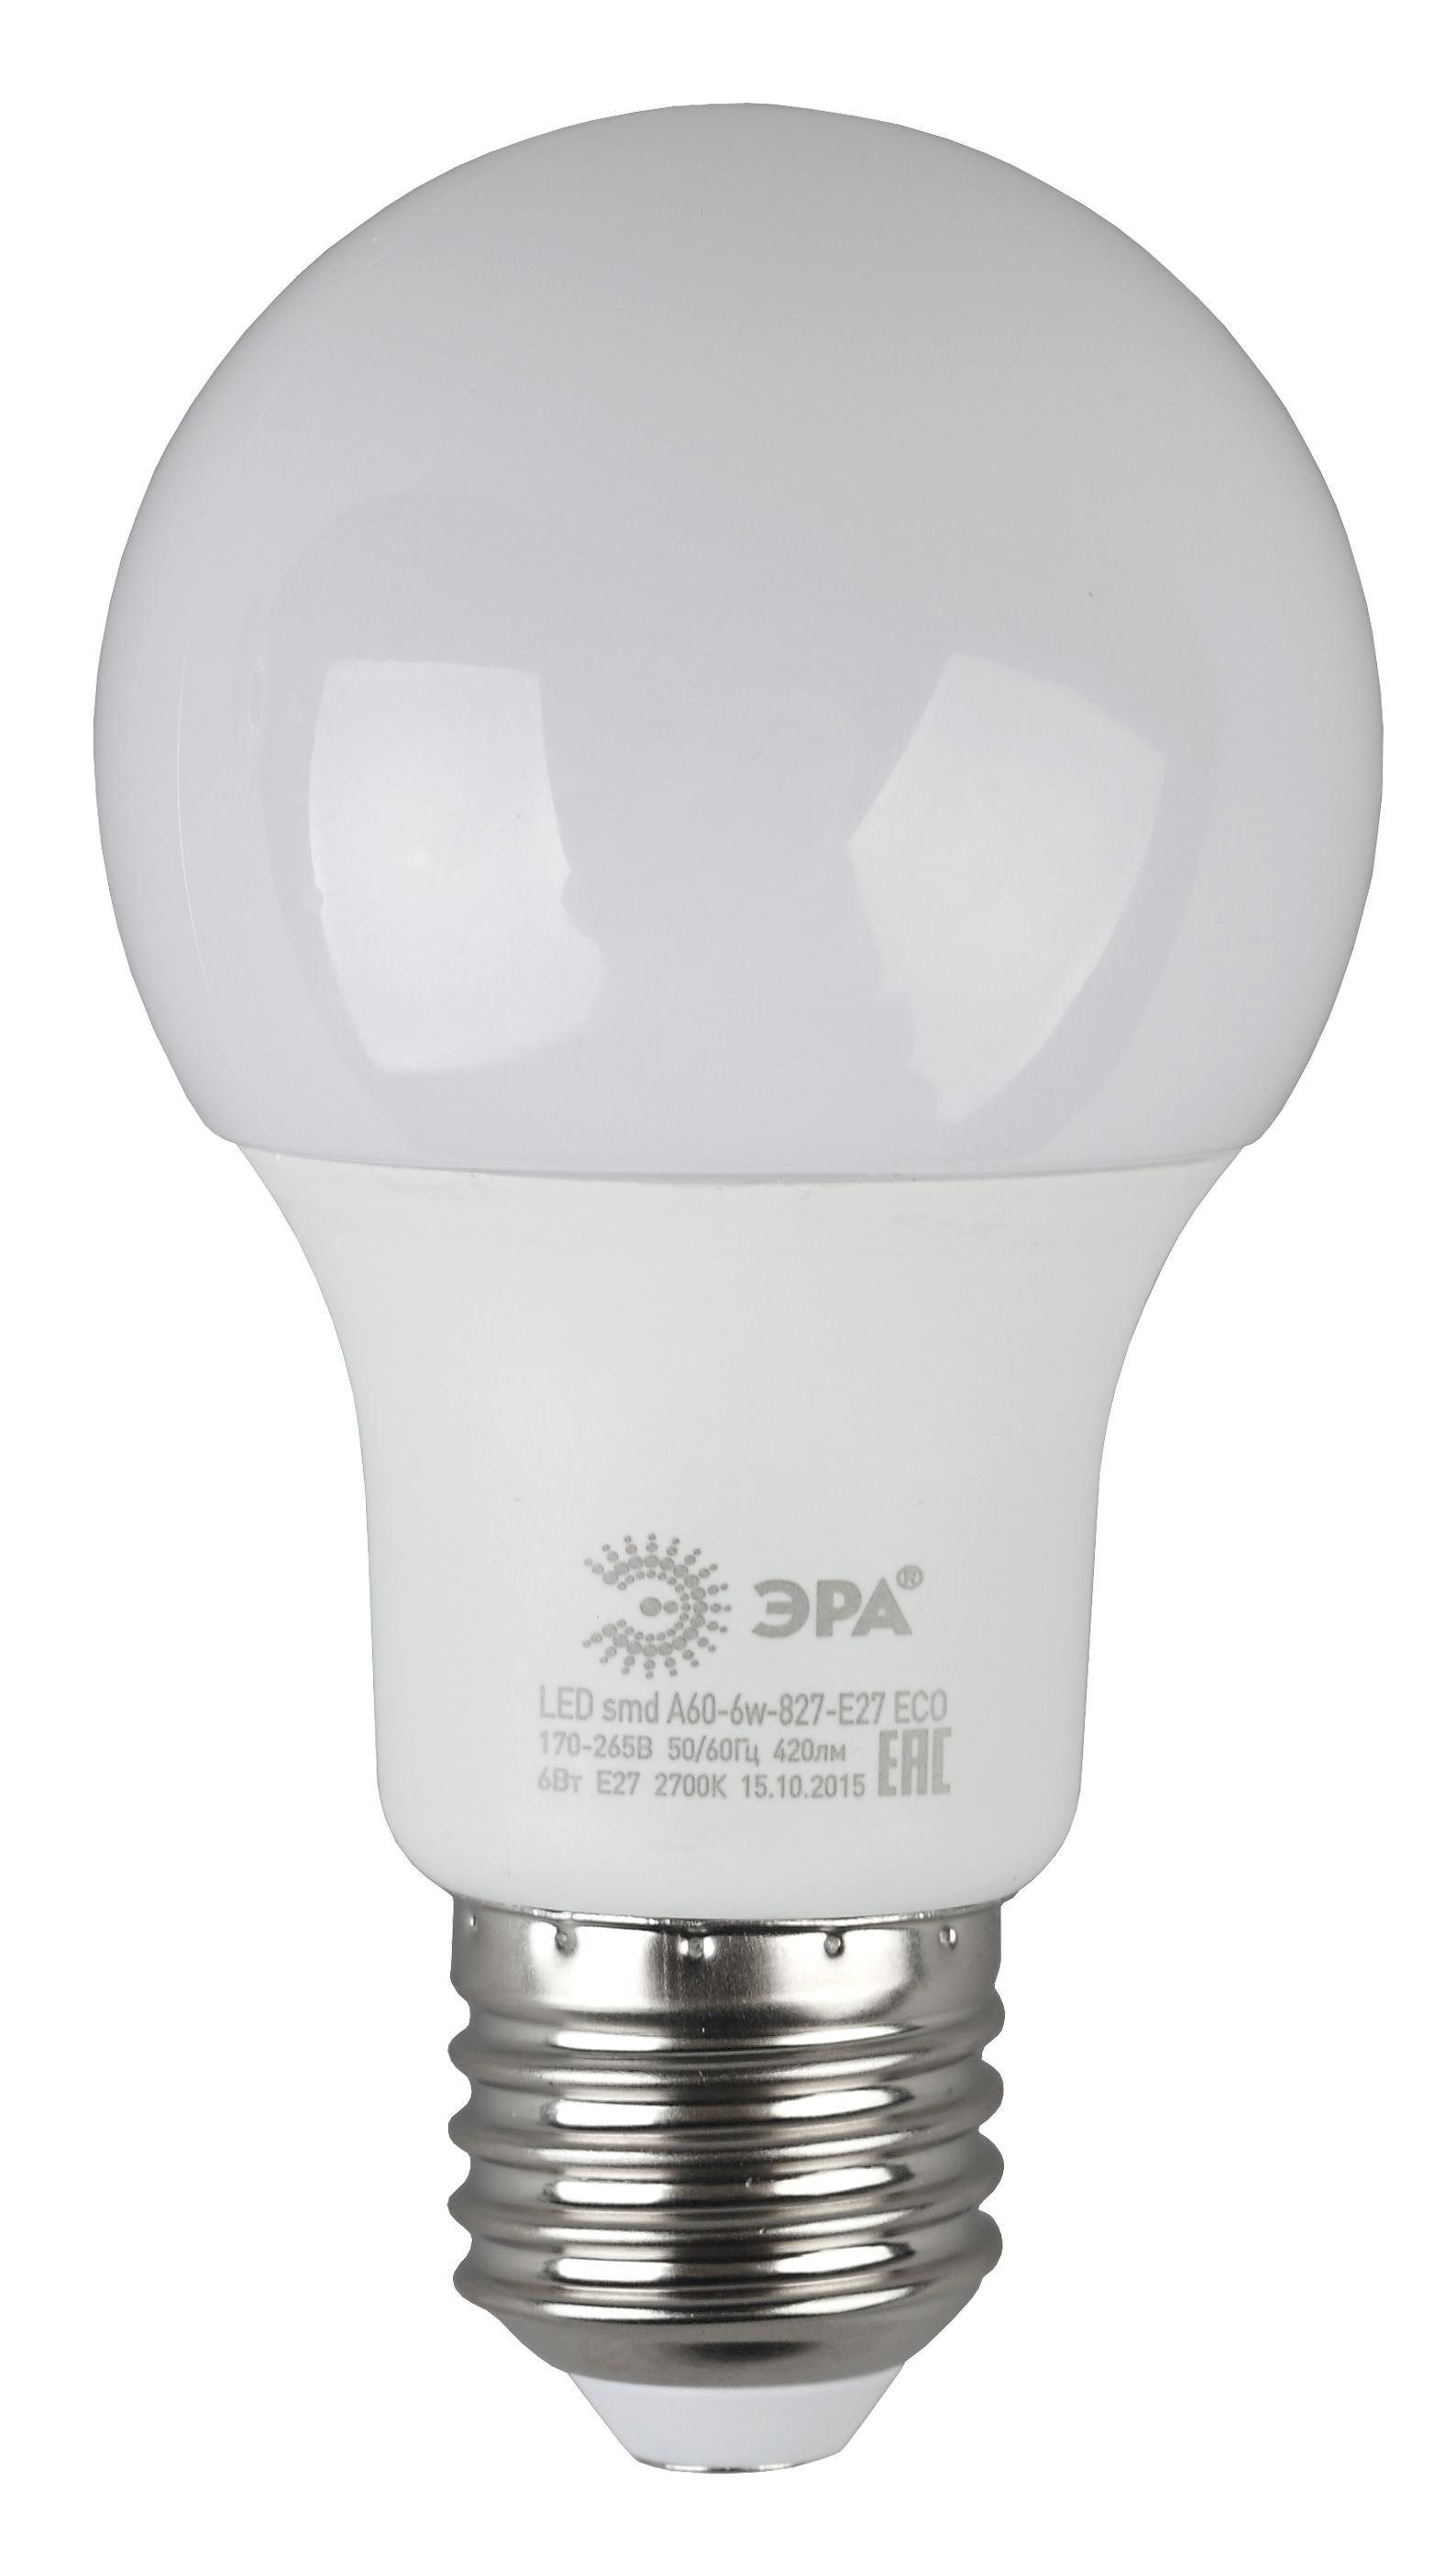 Лампа светодиодная ЭРА Led smd a60-6w-827-e27 eco